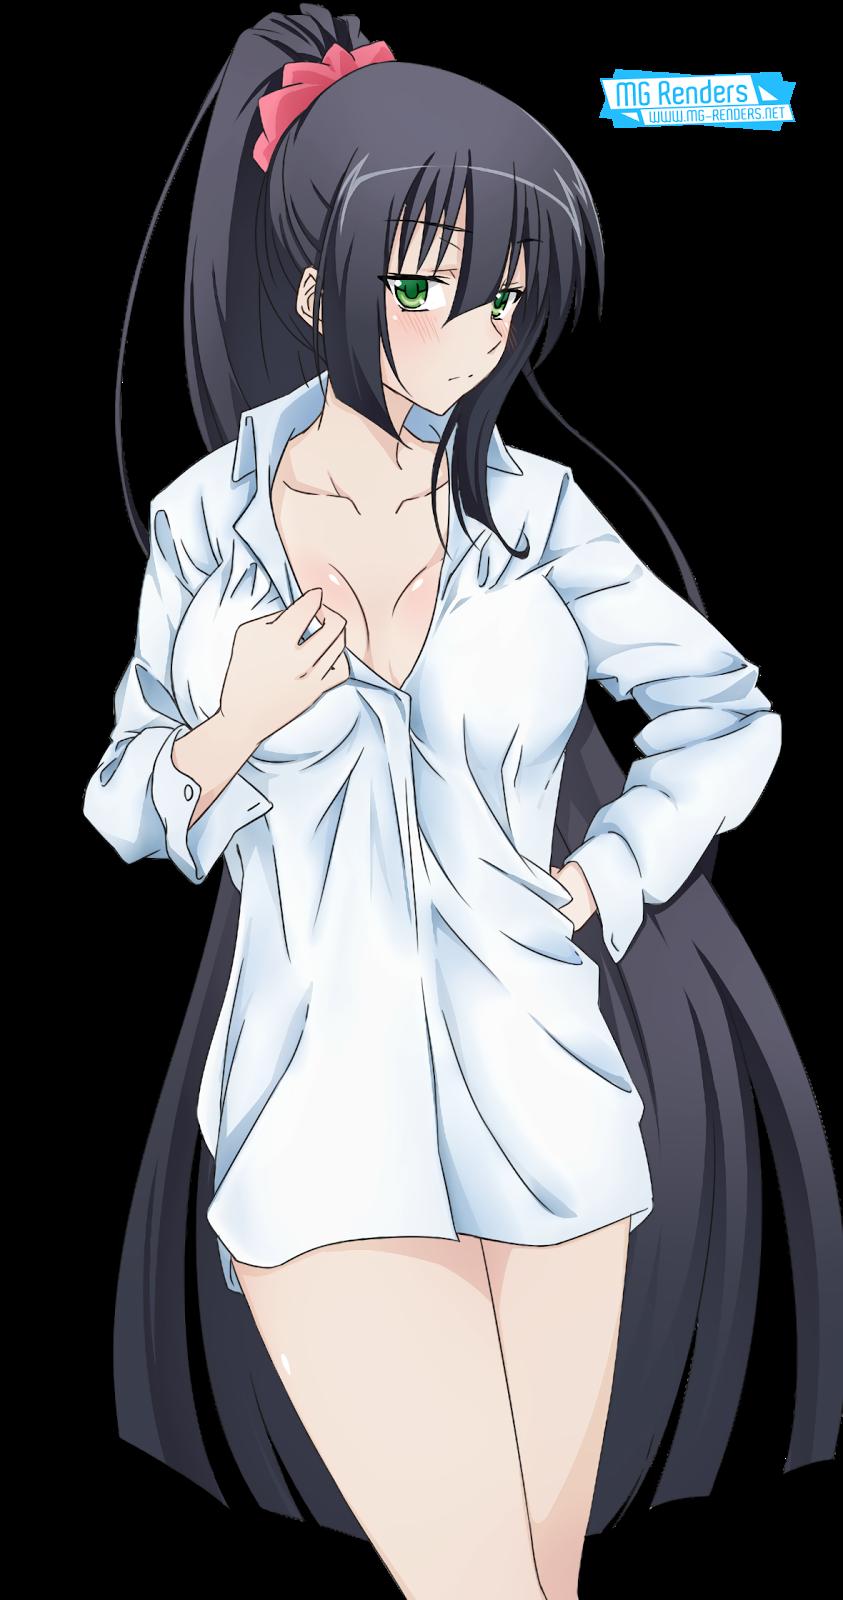 Tags: Anime, Render,  Kore wa Zombie Desuka?,  Seraphim,  PNG, Image, Picture